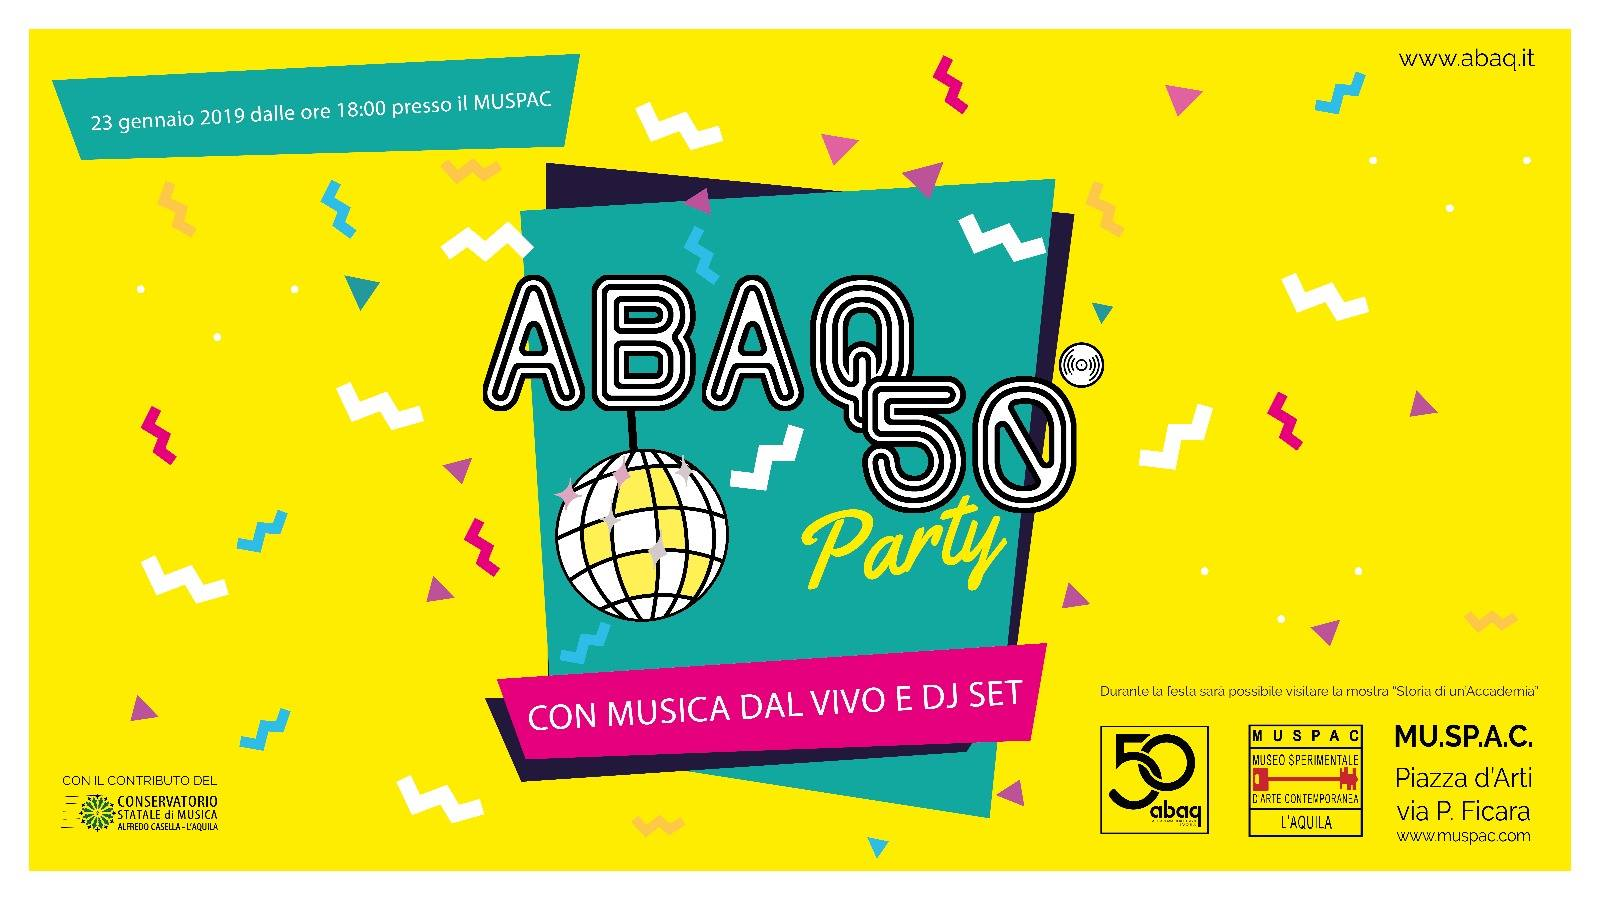 festa abaq